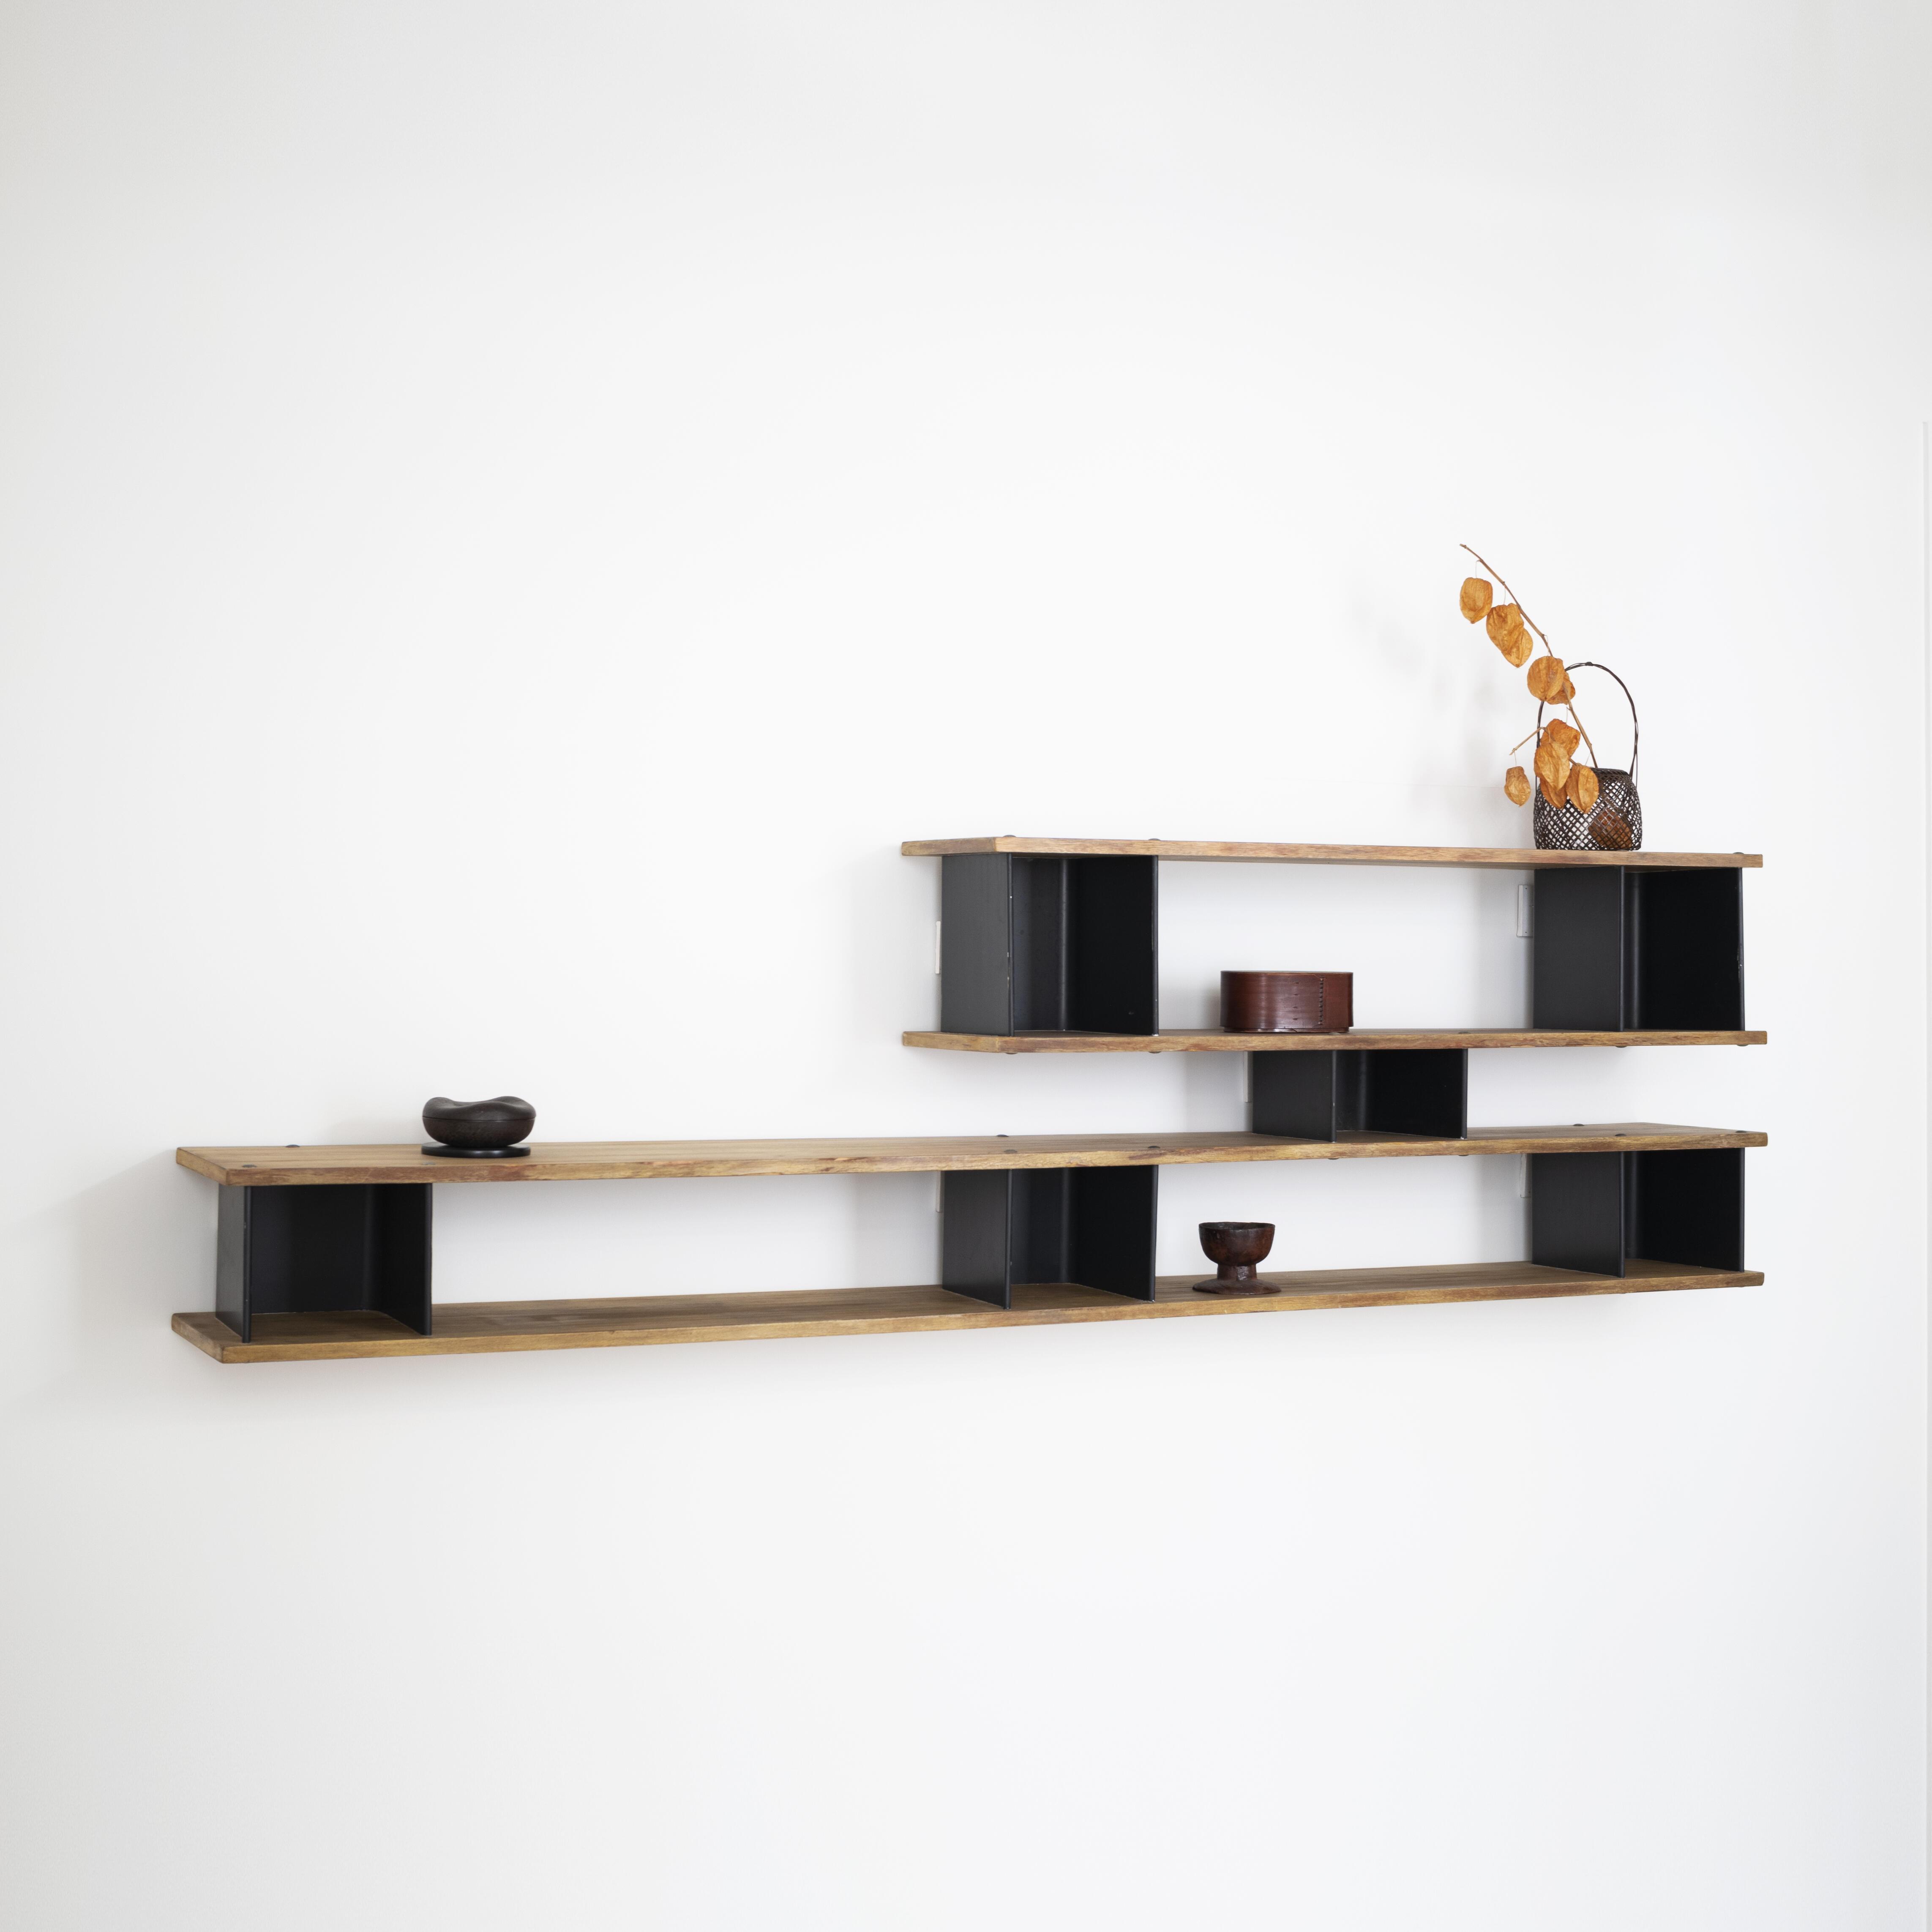 perriand wall shelf ペリアン シェルフ